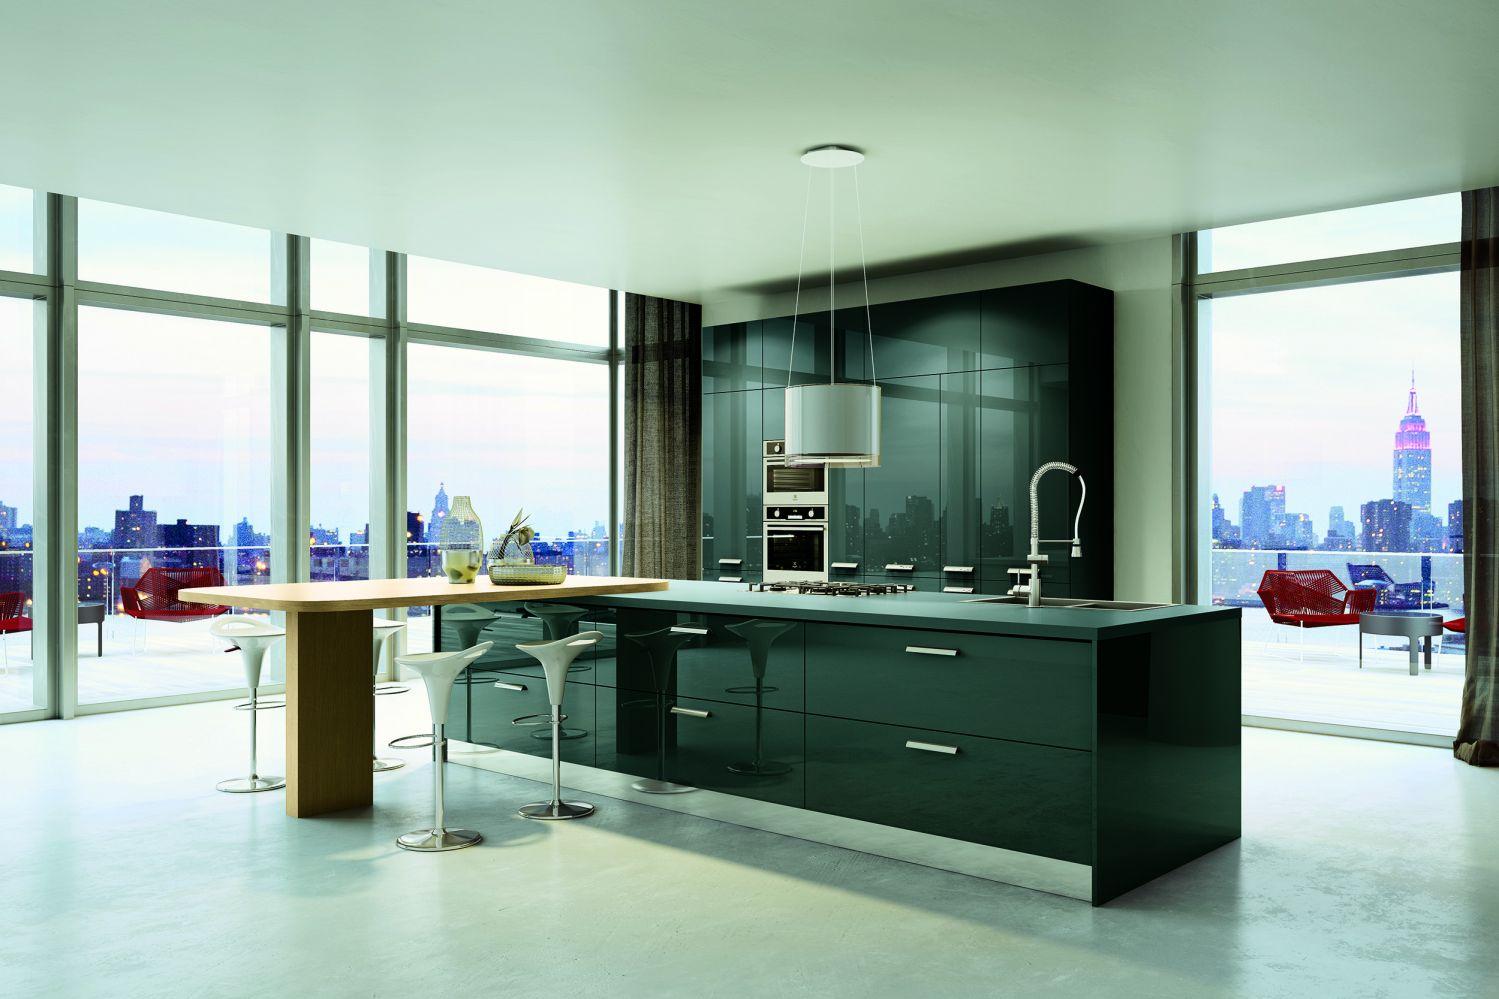 cuisine design italienne marseille. Black Bedroom Furniture Sets. Home Design Ideas